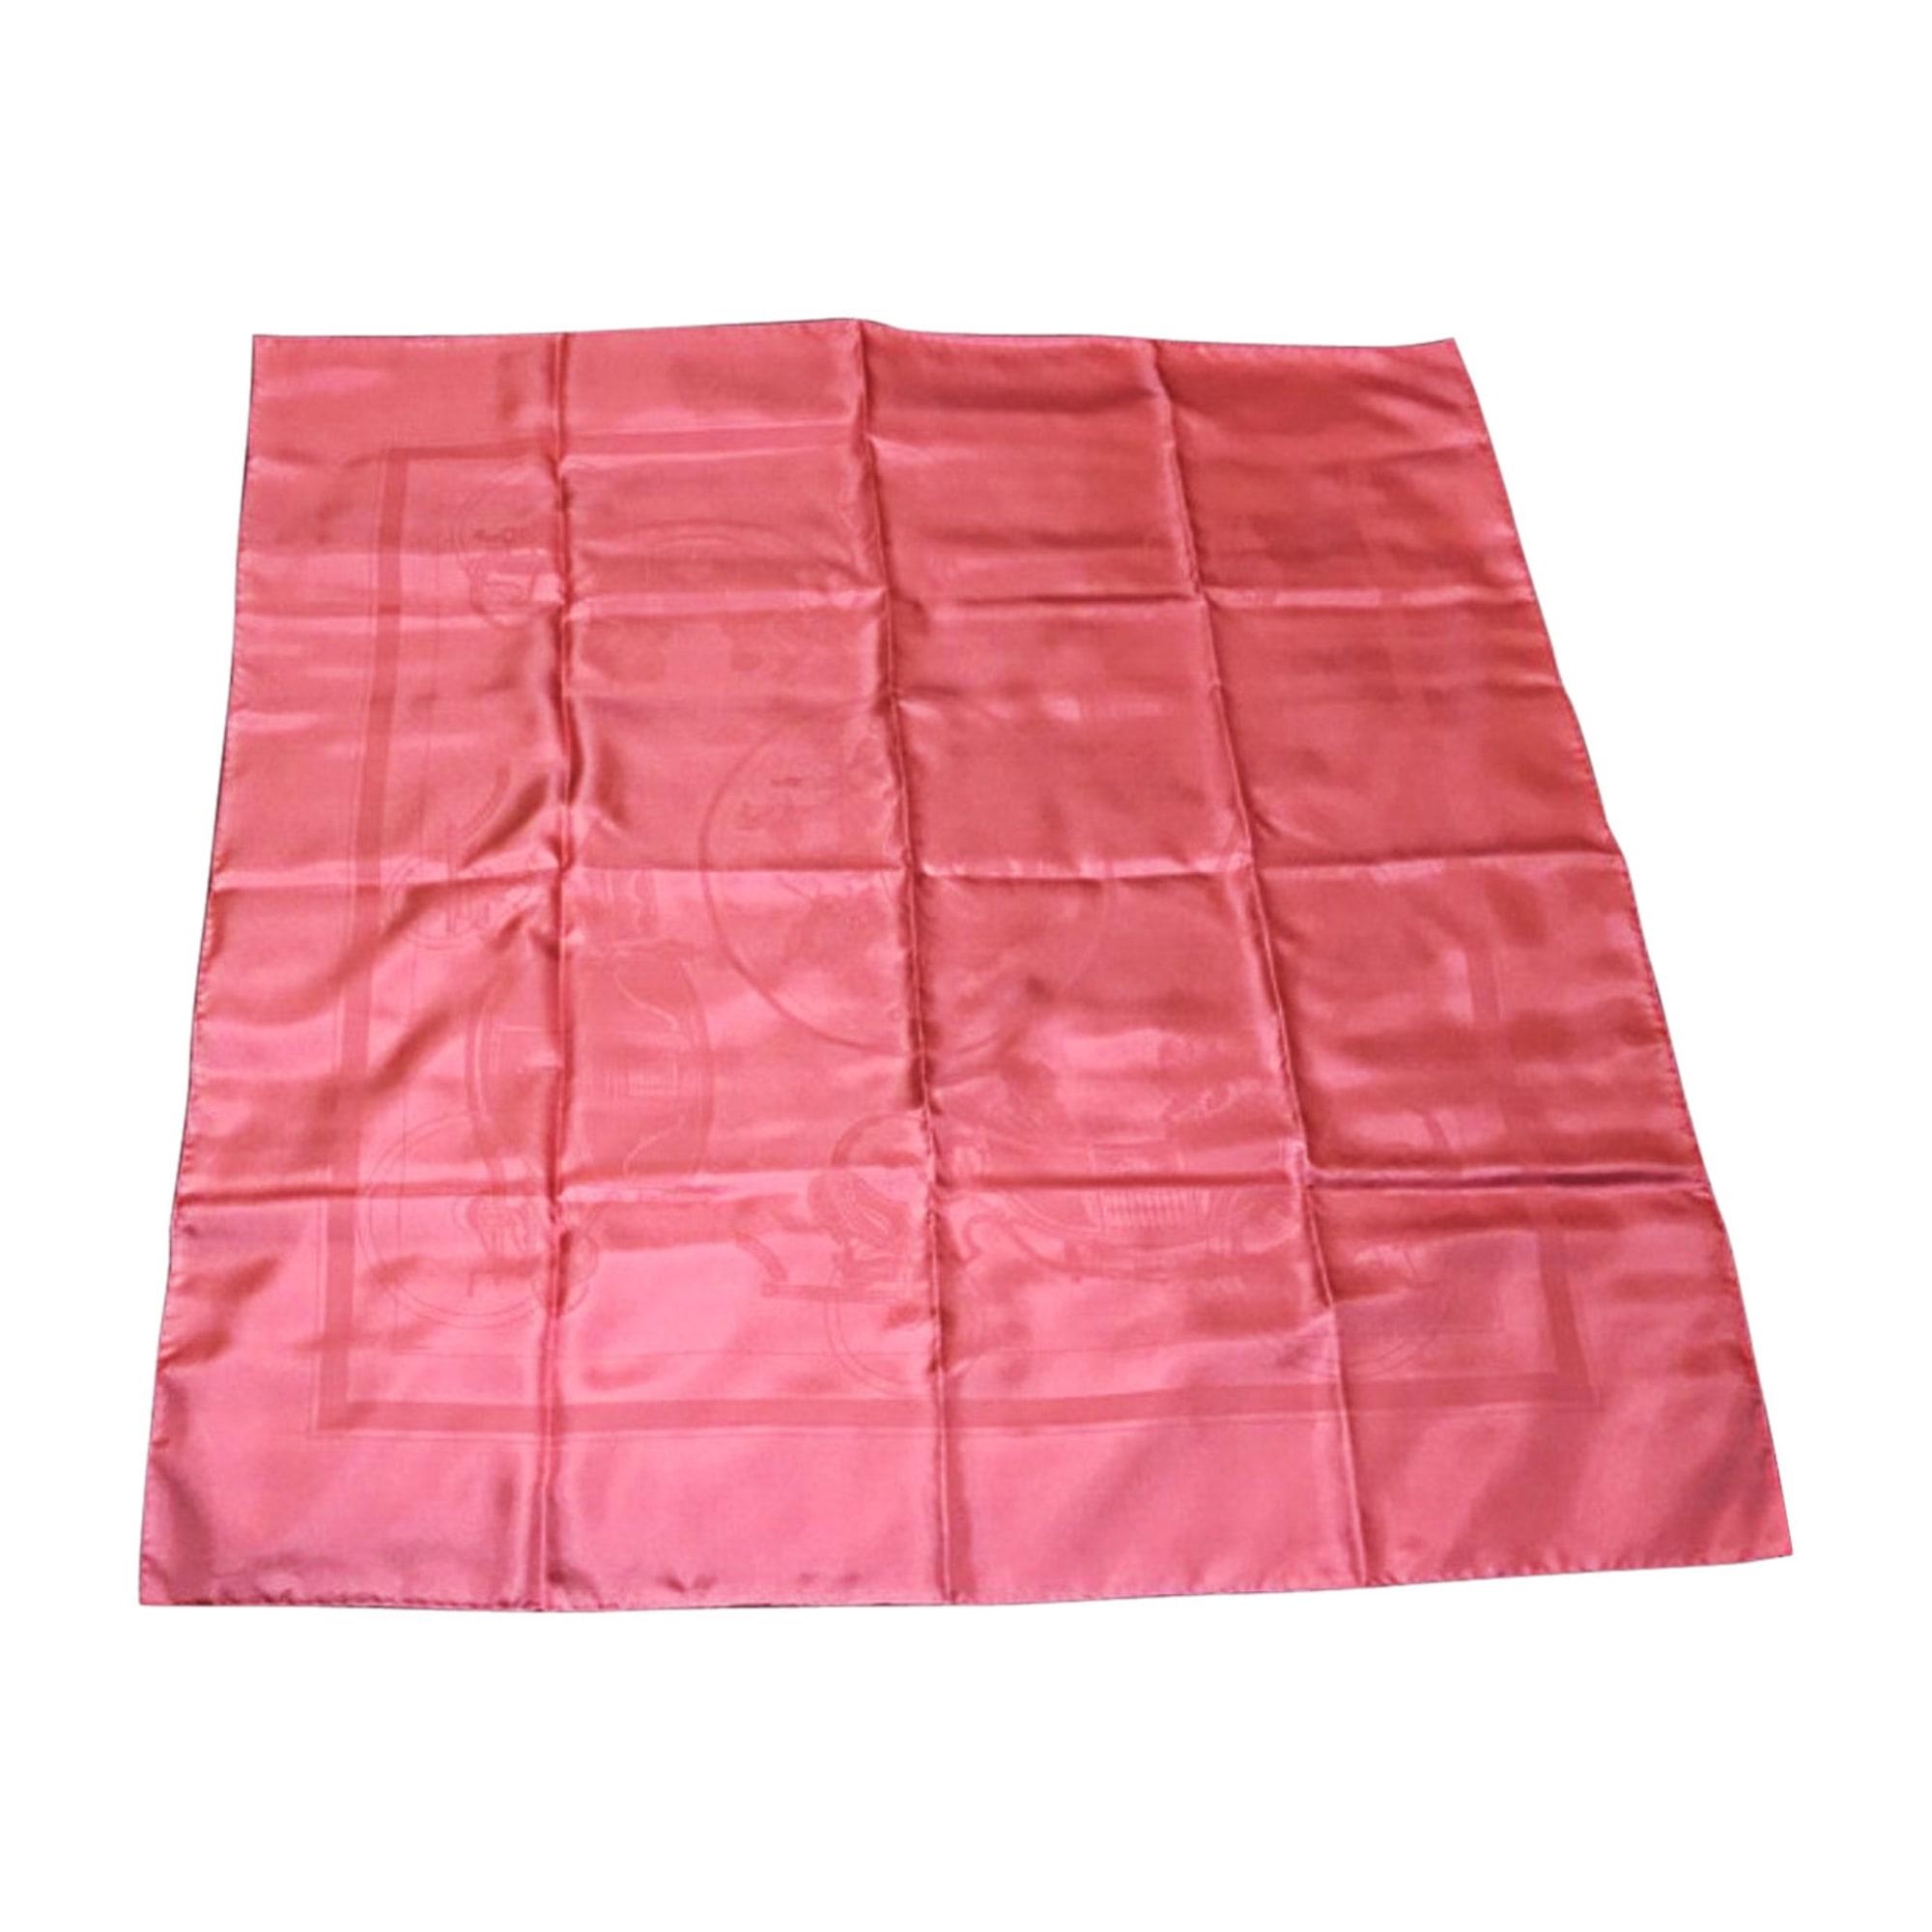 Tuch, Schal HERMÈS Pink,  altrosa